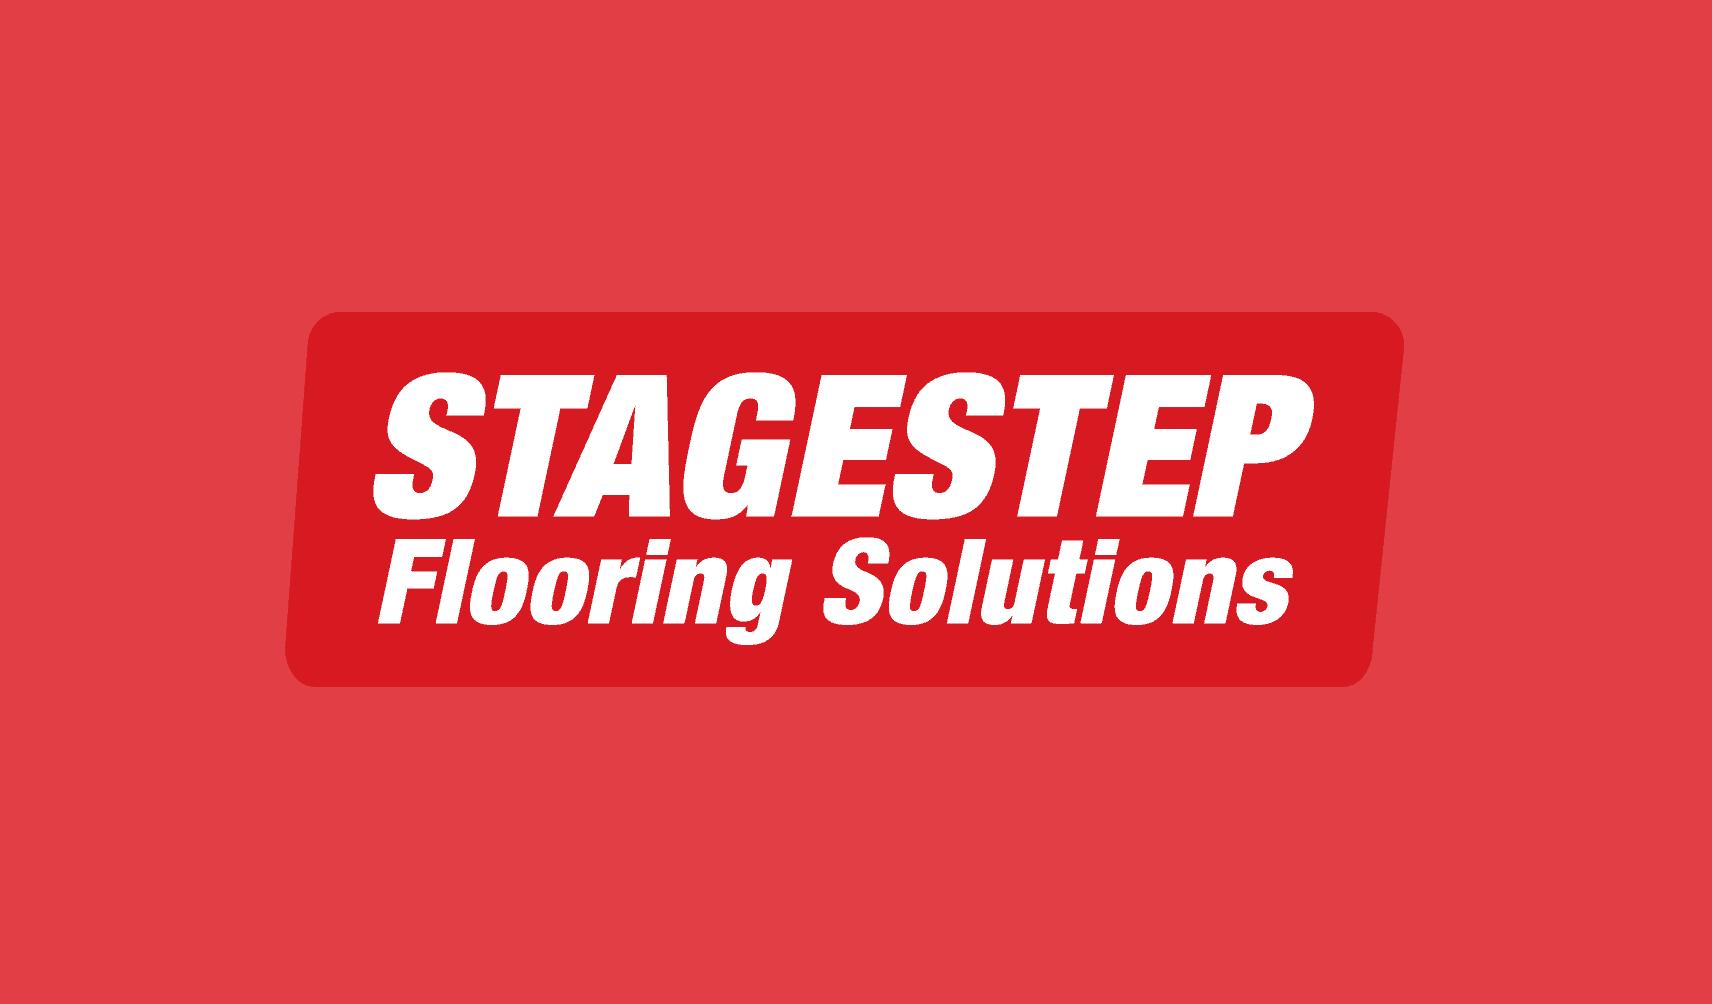 Stagestep 5.16.19